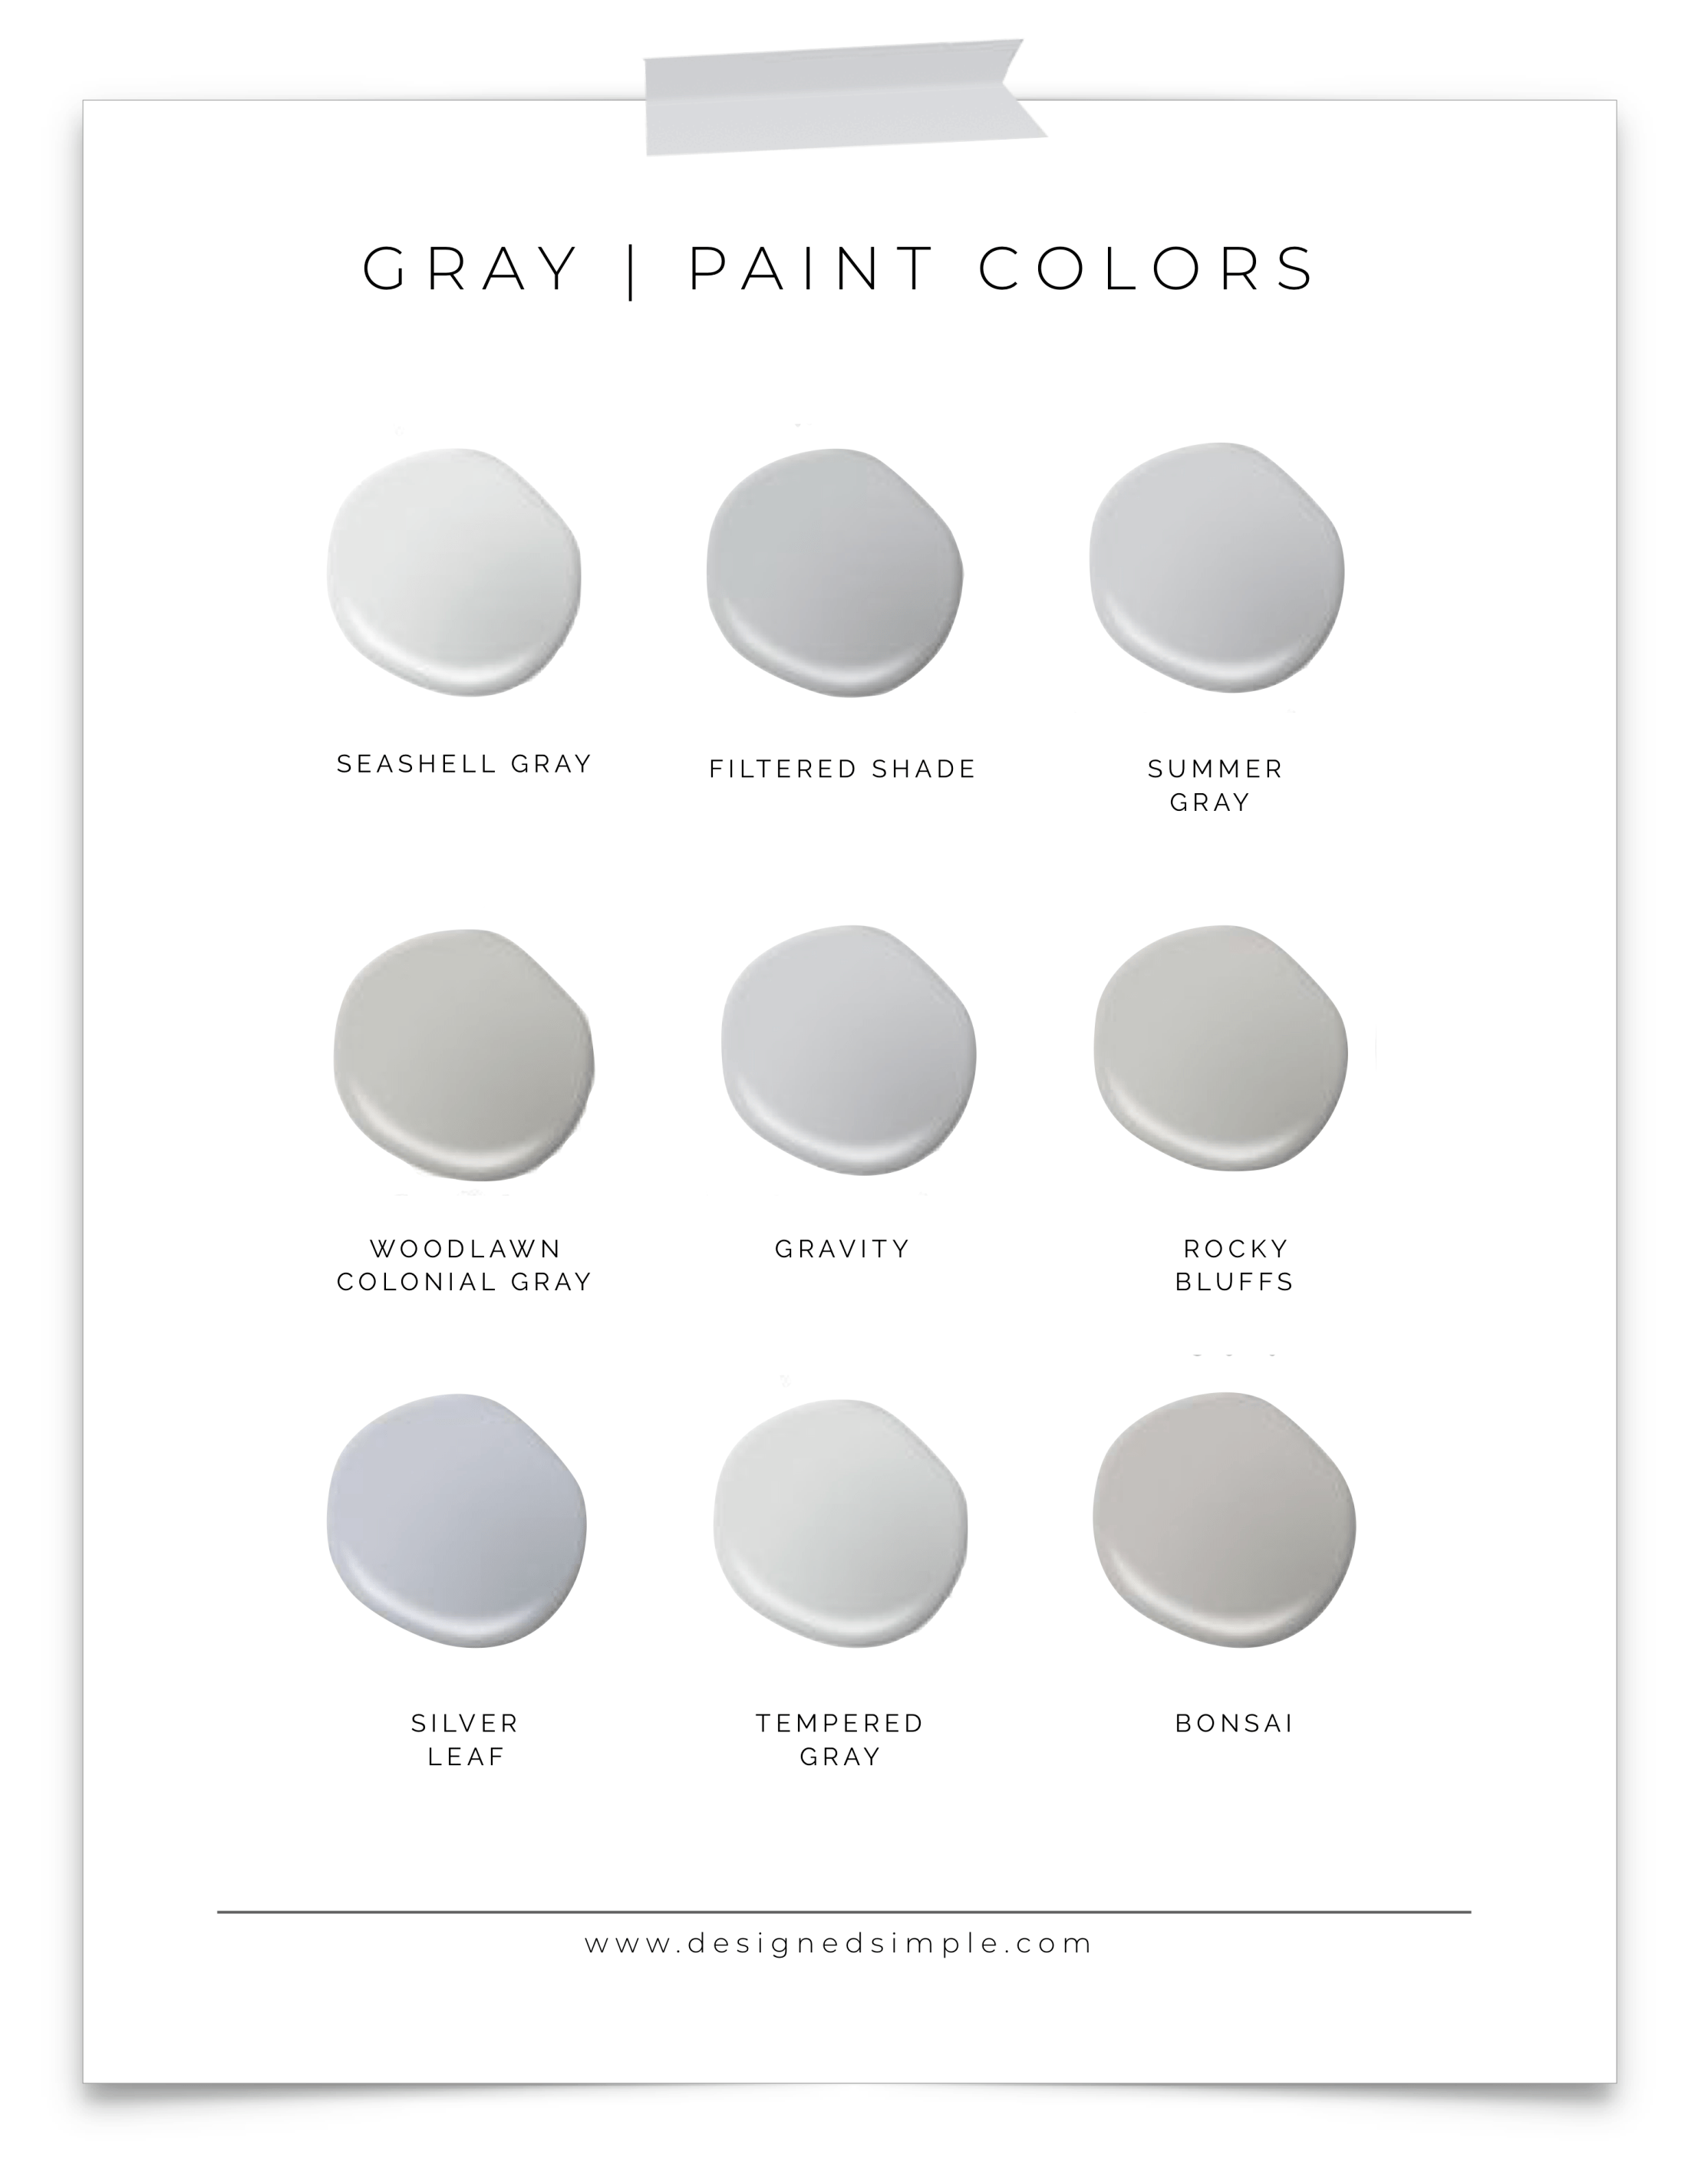 Valspar Gray Paint Colors Favorite Grays In Our Home Designed Simple Designedsimple Com Valspar Paint Colors Gray Office Paint Colors Valspar Gray